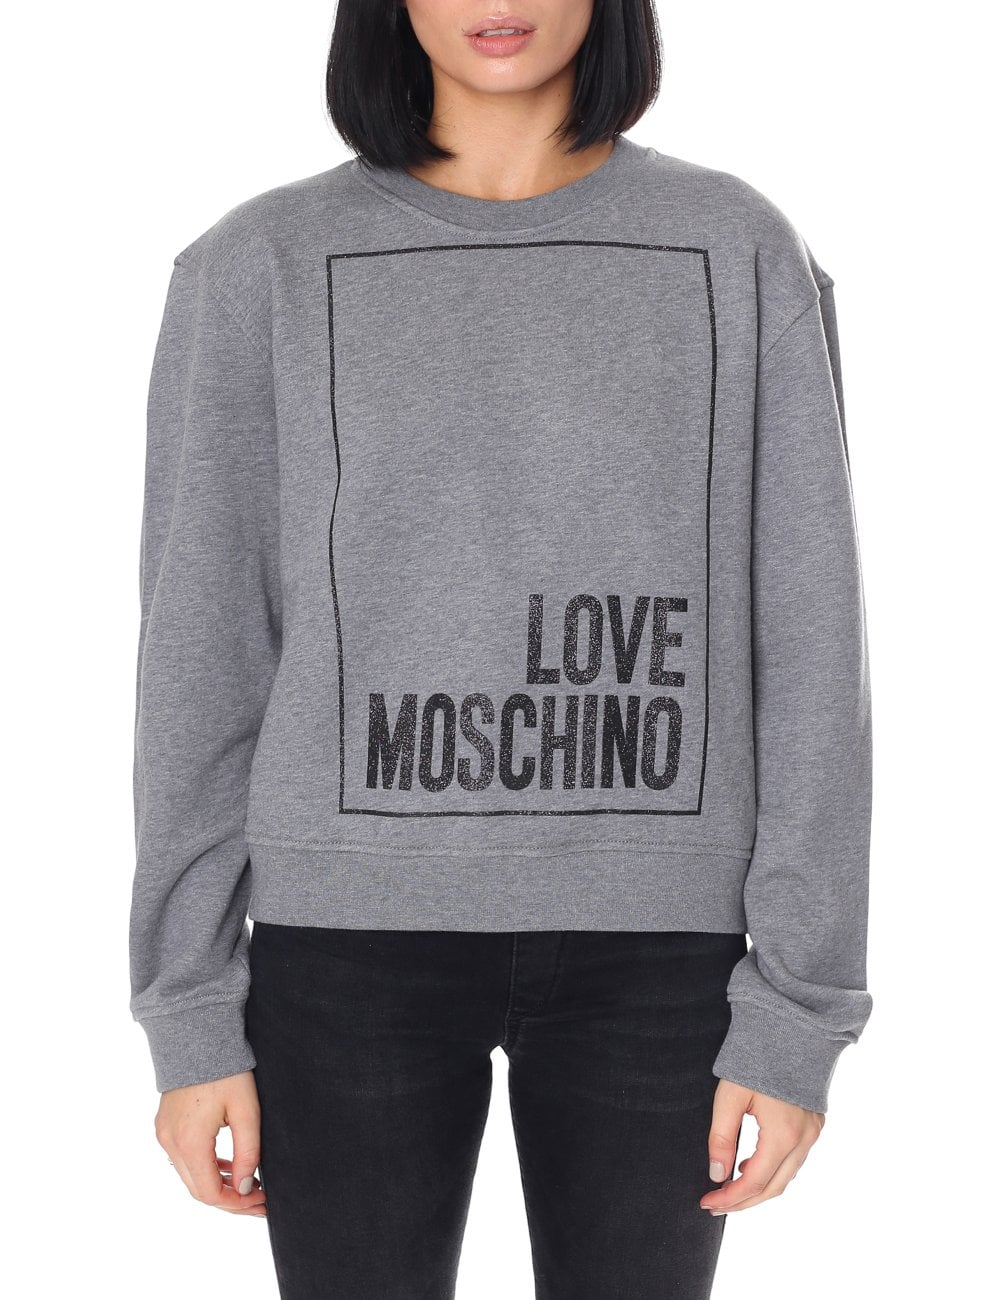 9d01f5c3654a1 Love Moschino Women's Glitter Box Logo Sweat Top